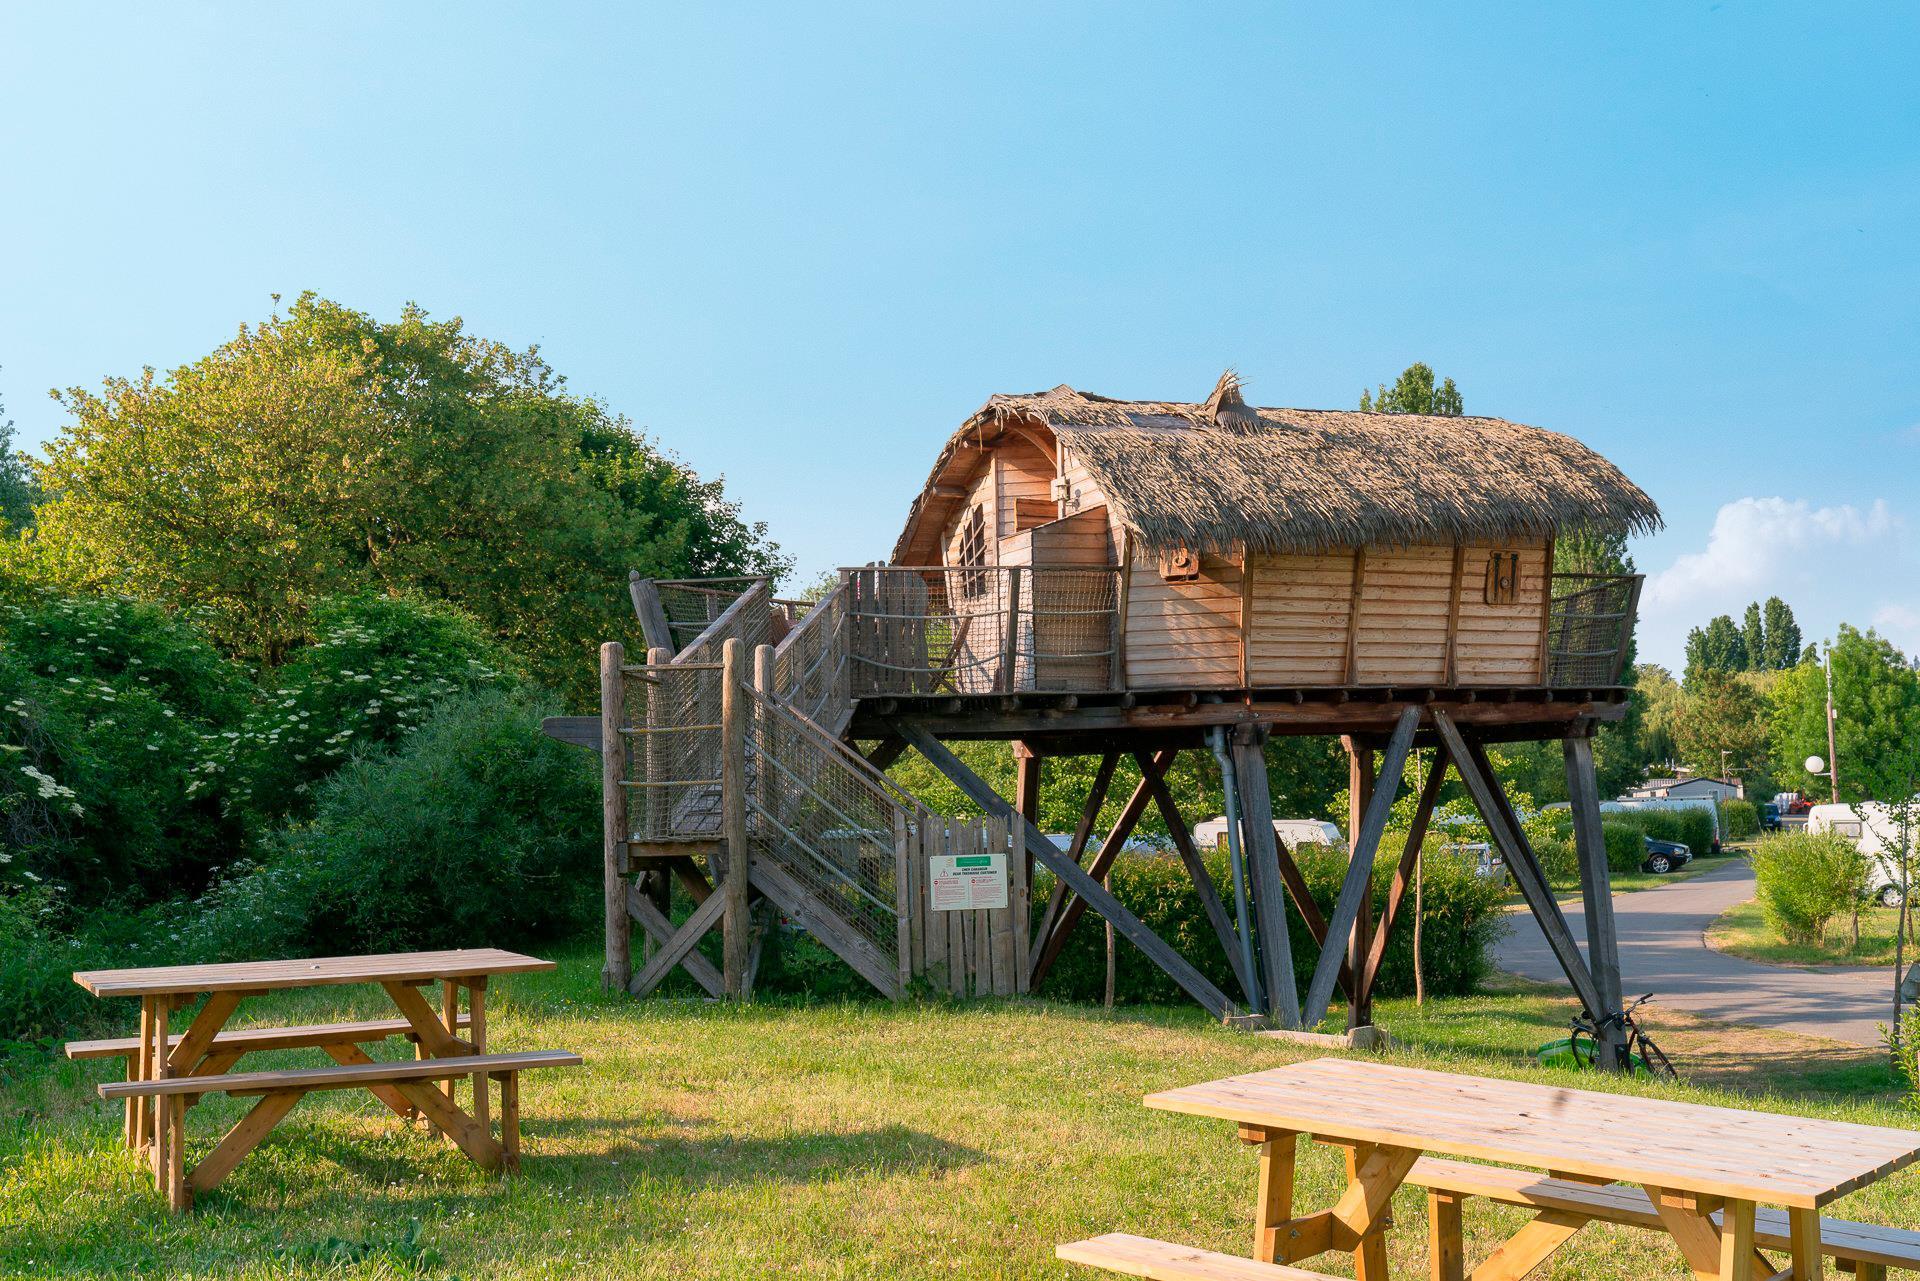 Location - Cabane Love 2 Chambres - Camping Sandaya Paris Maisons-Laffitte